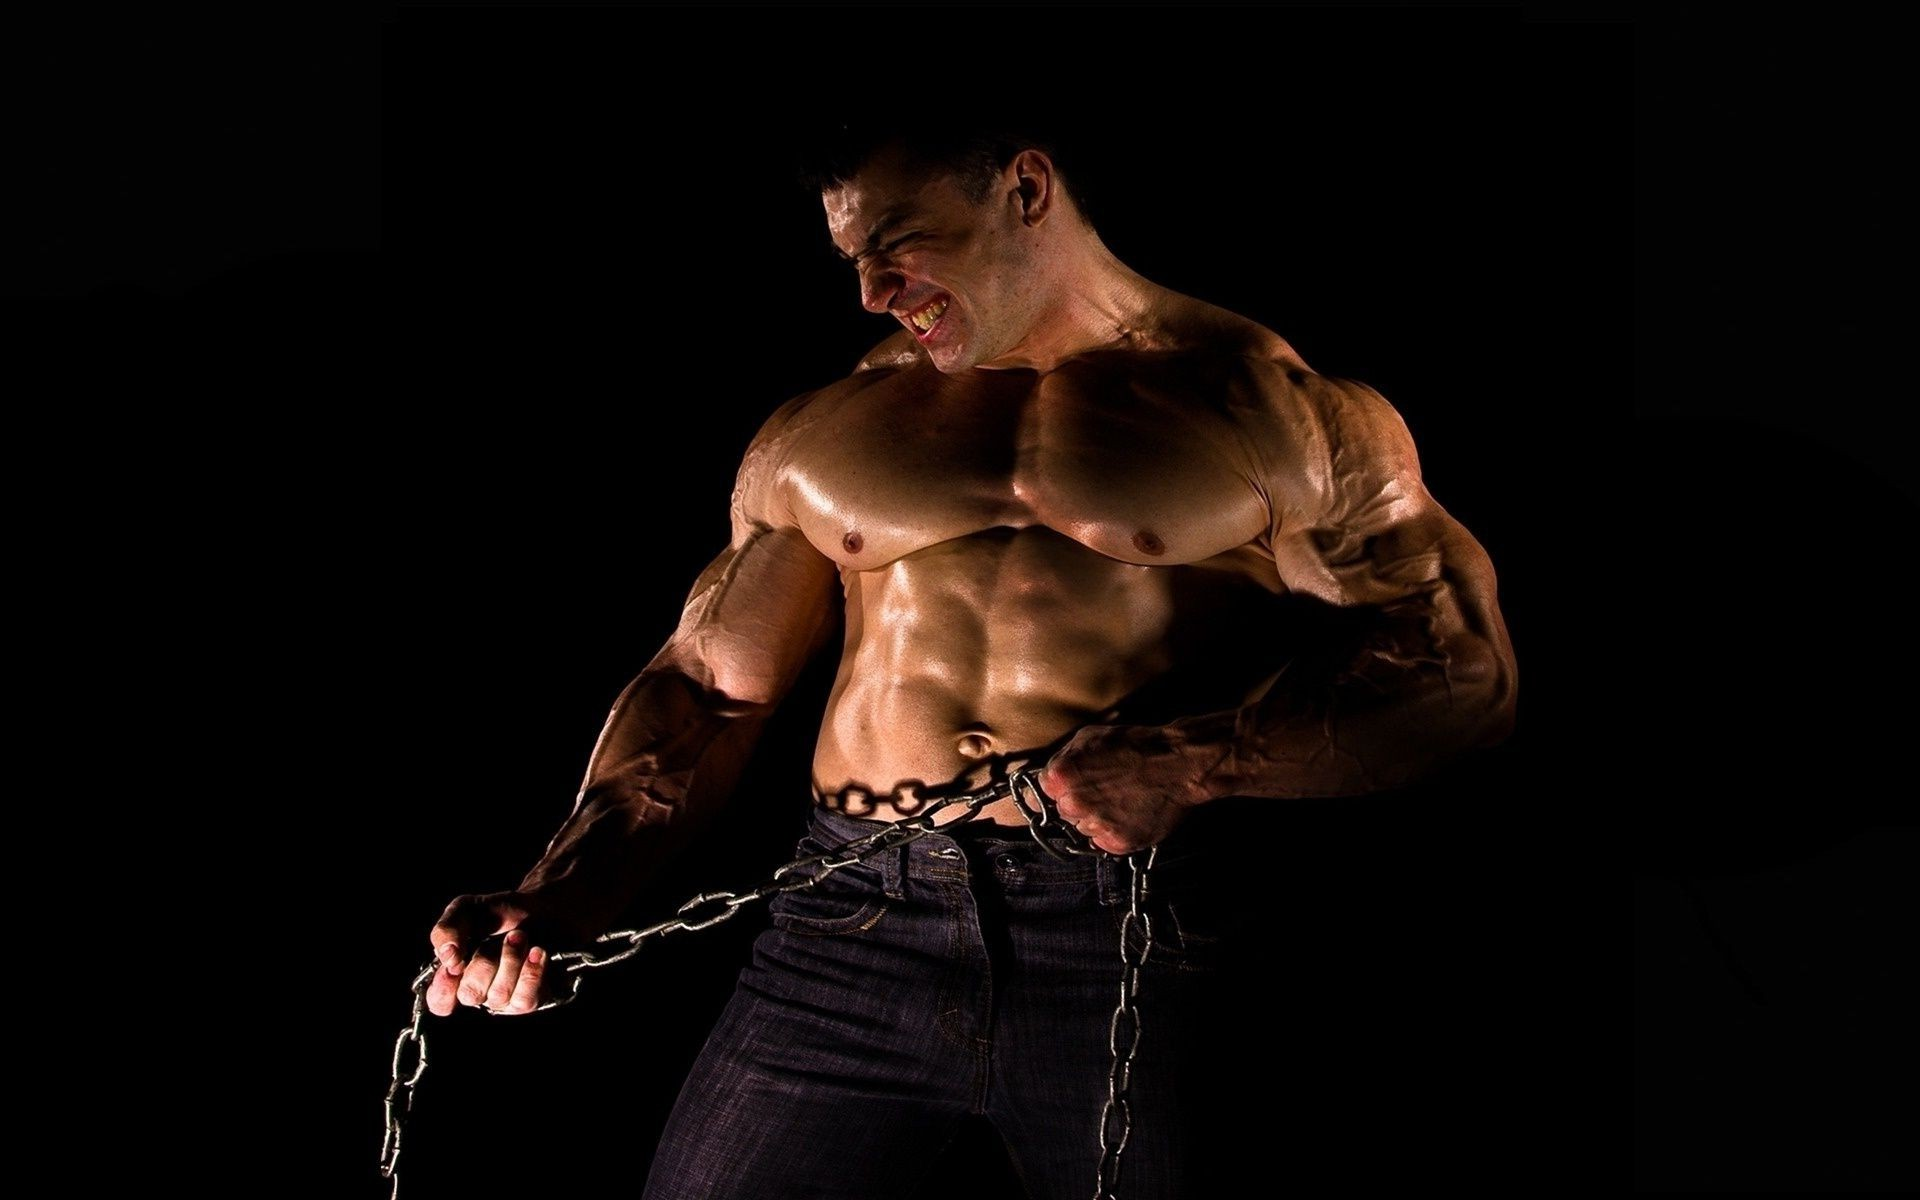 black-bodybuilder-pictures